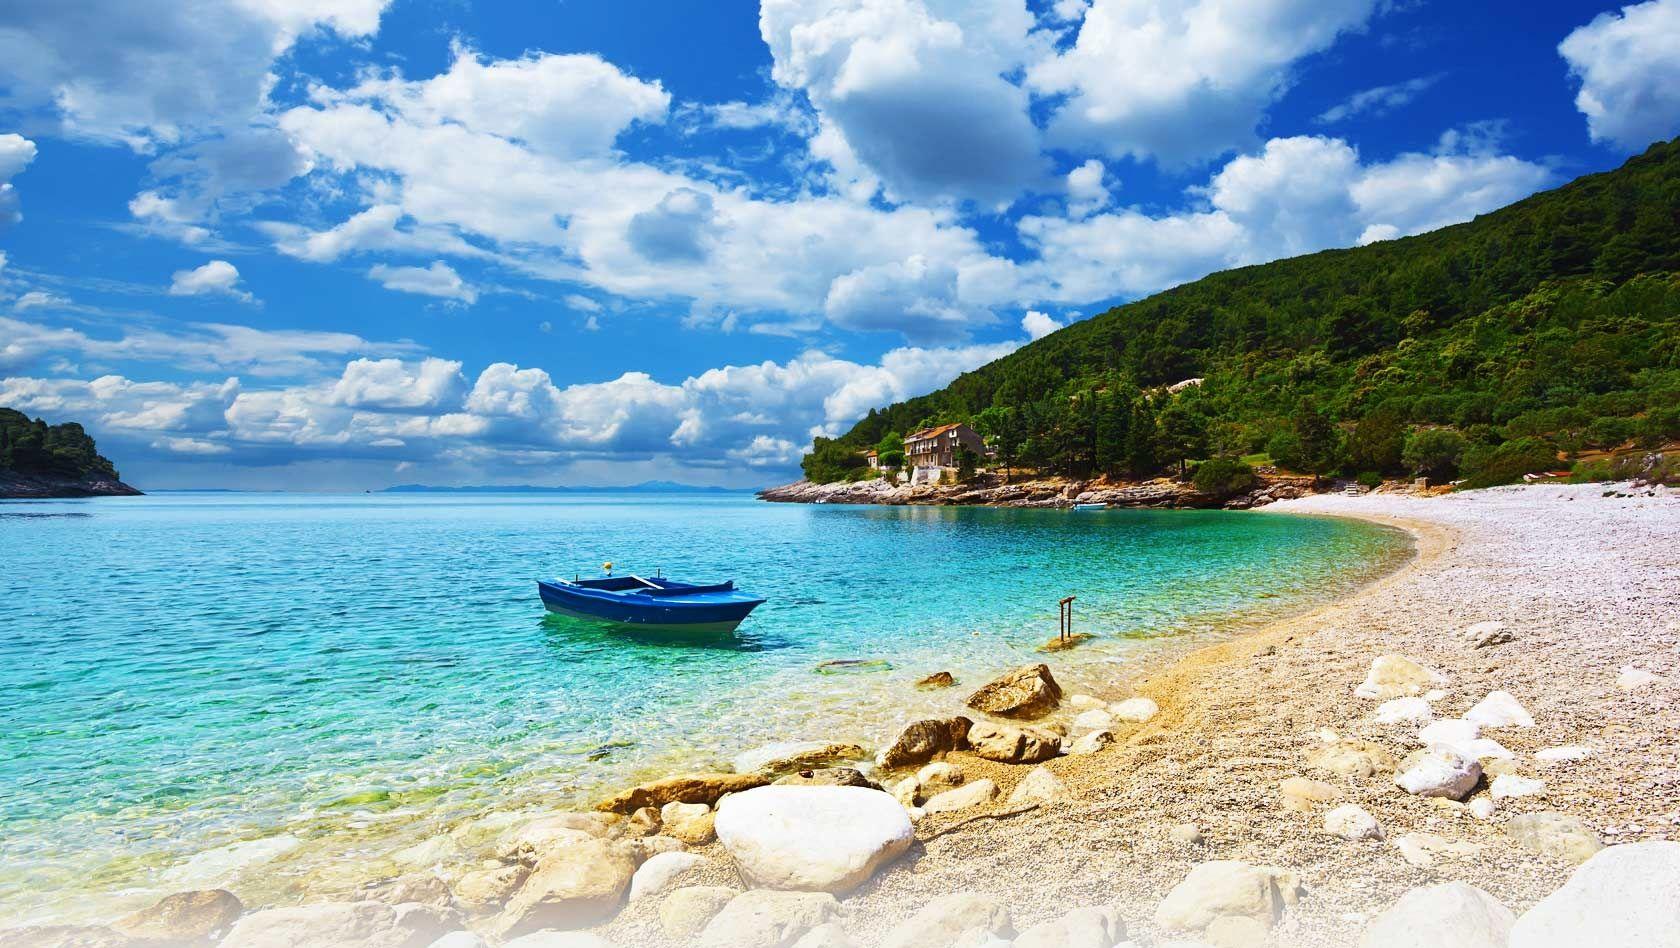 Seaside Villa in Dubrovnik, Croatia image - Free stock